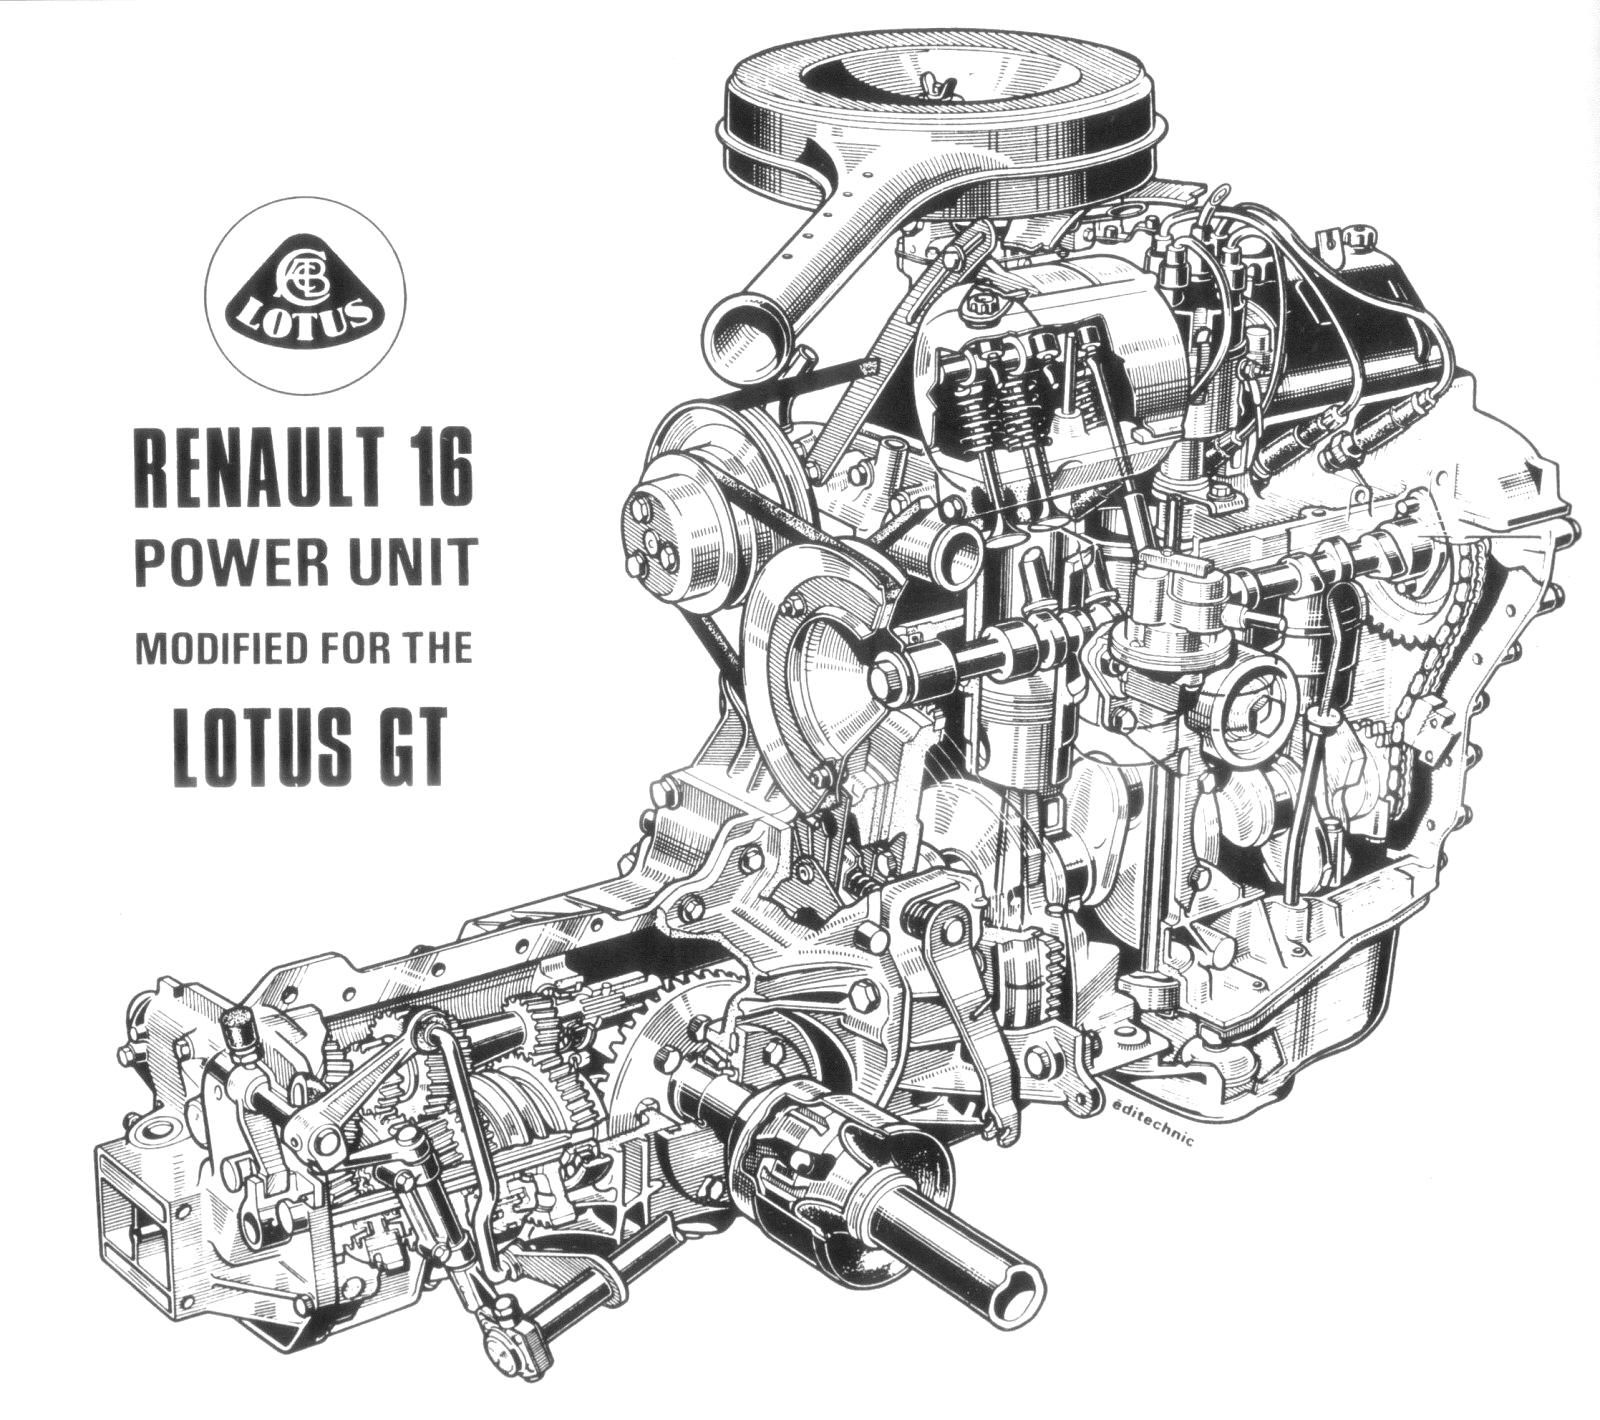 Lotus Renault Engine